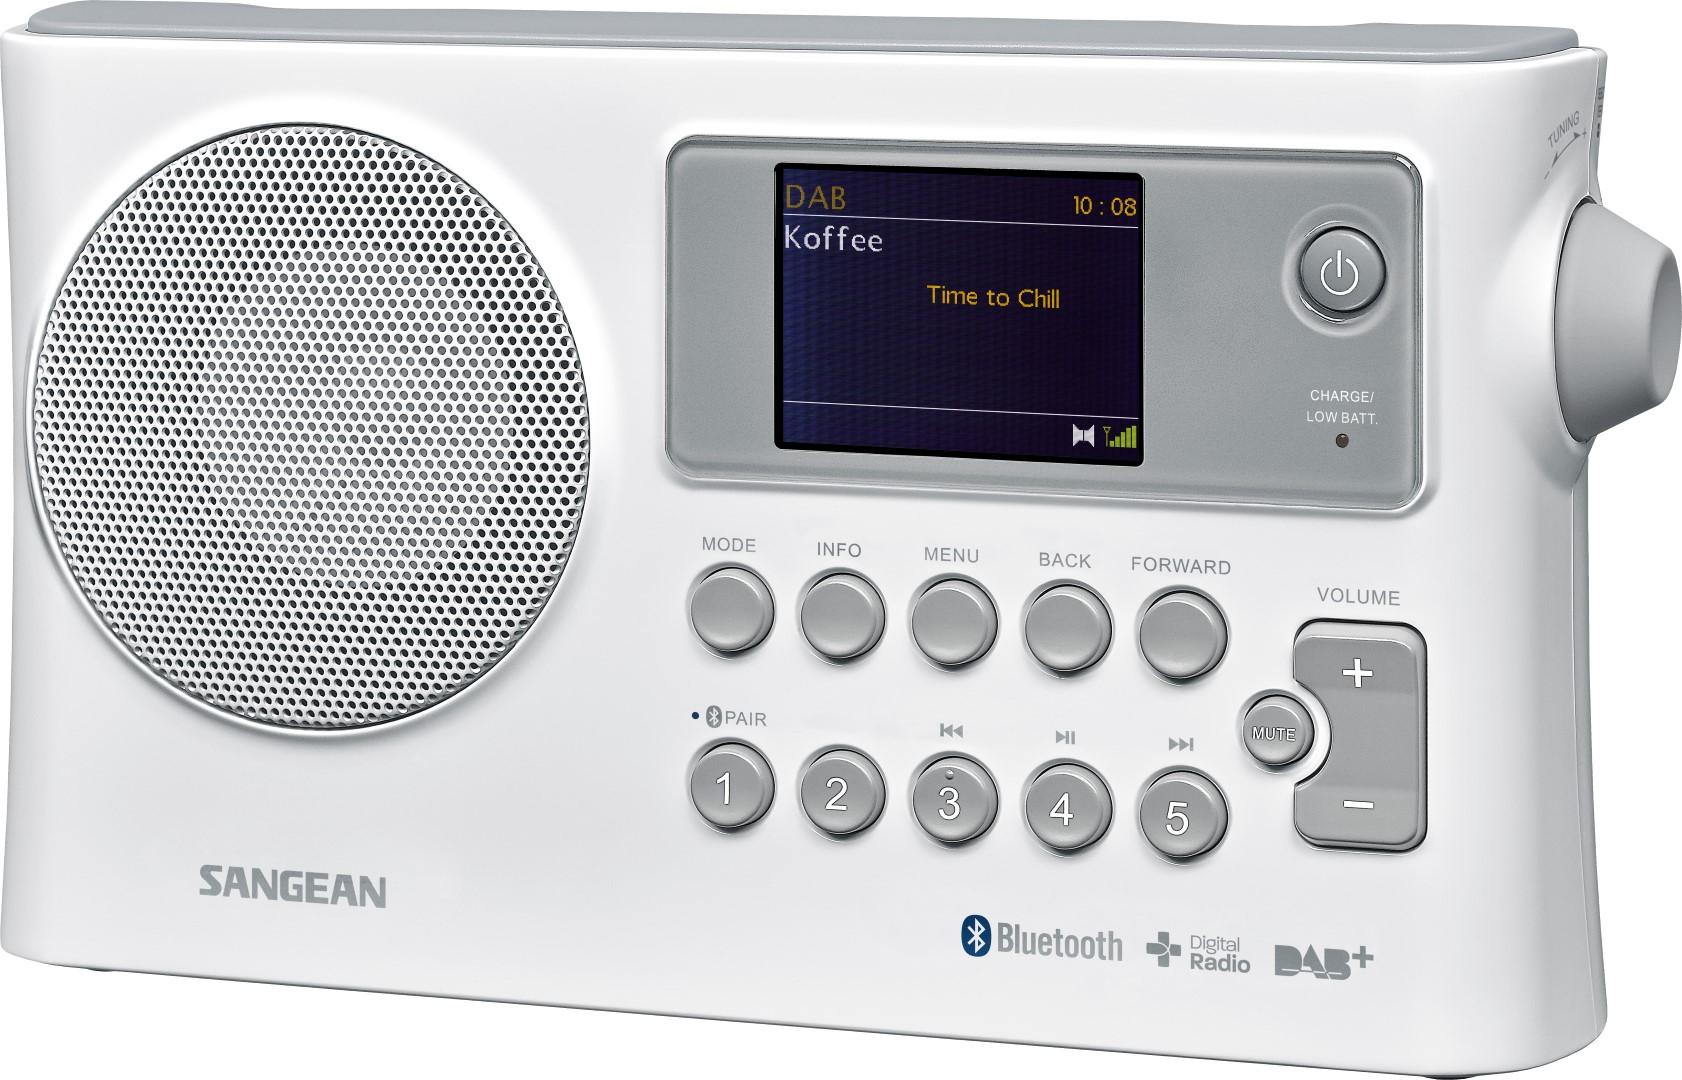 Compacte radio met DAB+, FM en Bluetooth - Sangean BTR-160